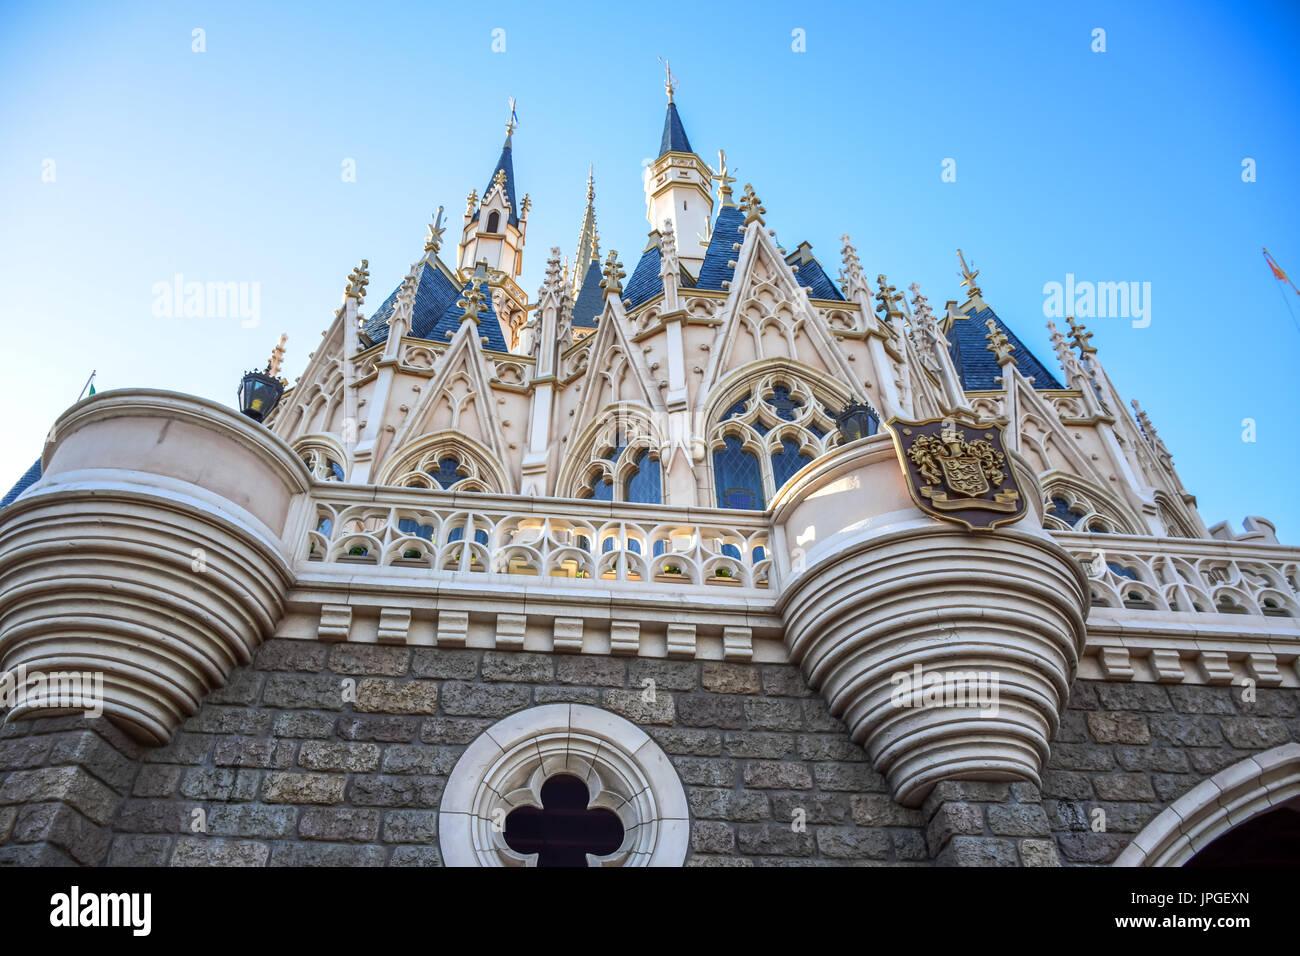 Tokyo Disneyland Cinderella Castle - Stock Image